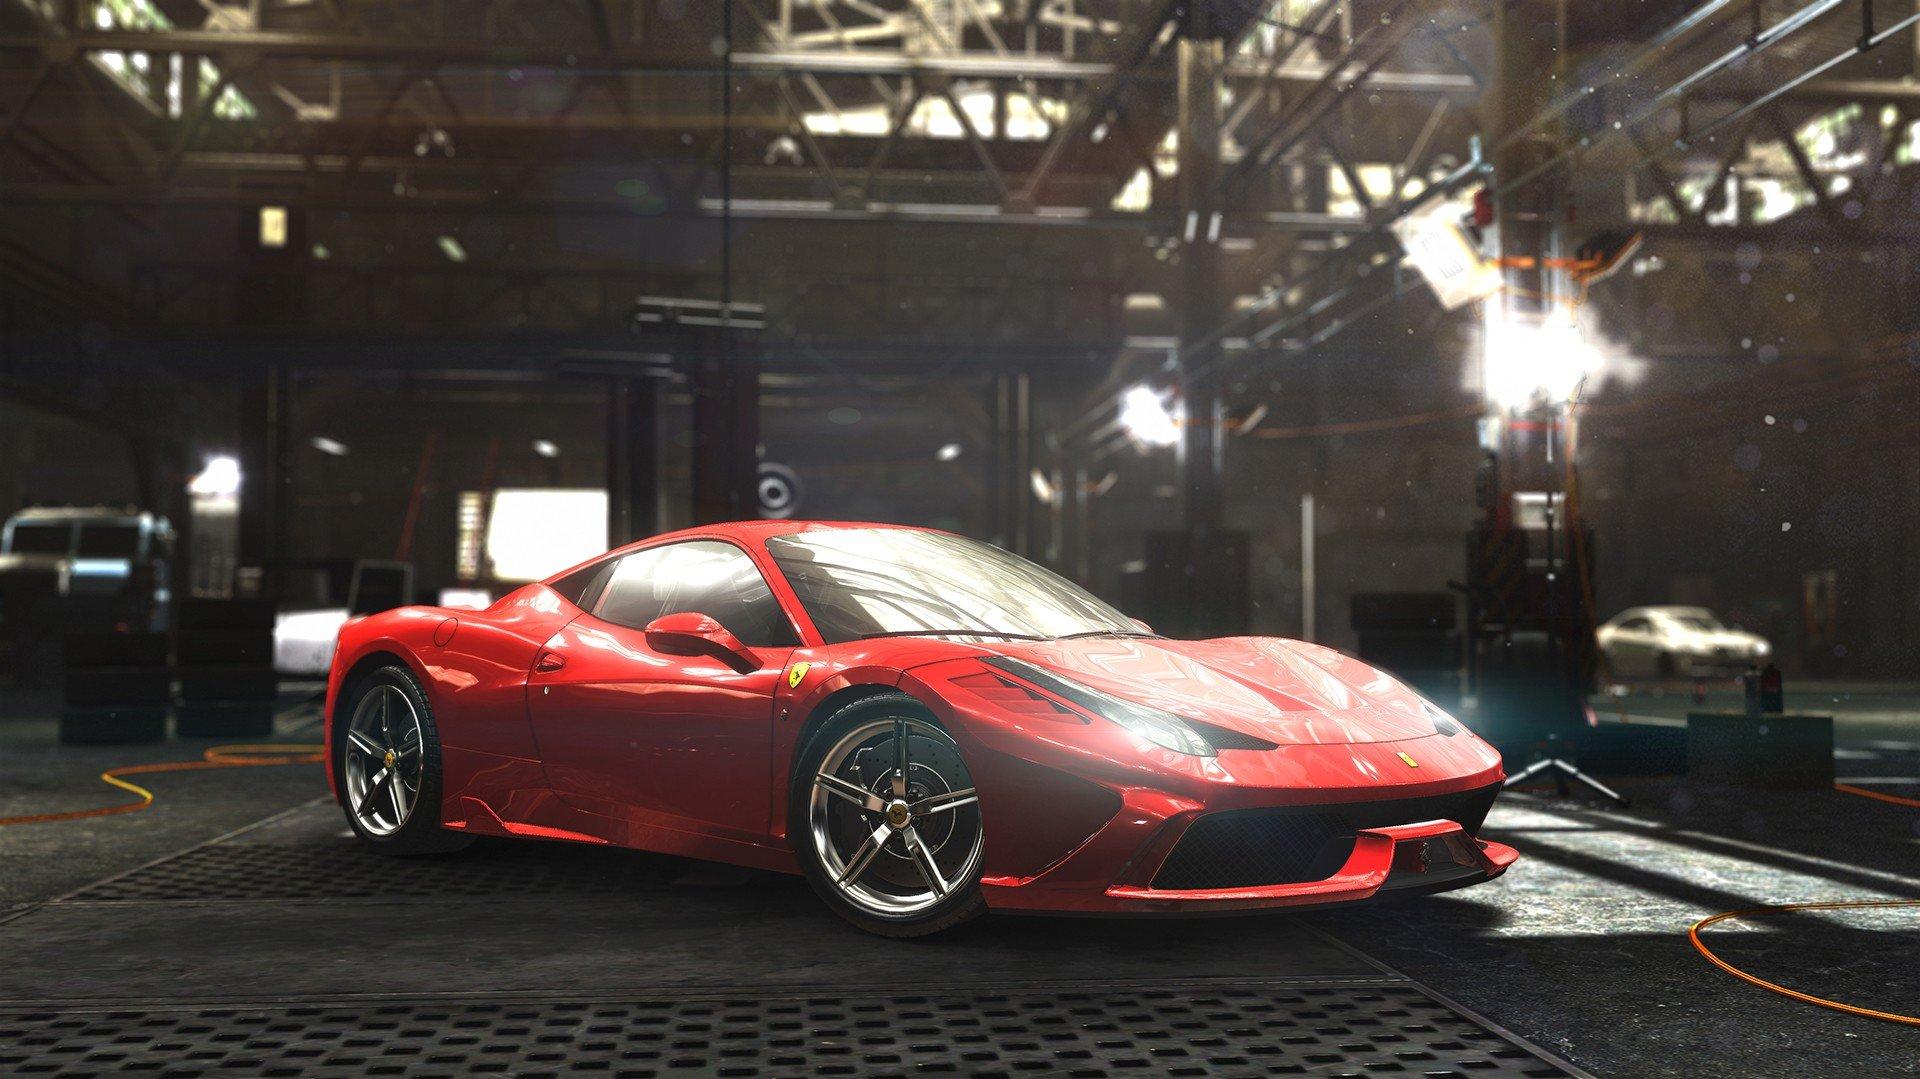 Ferrari 458 Speciale, Ferrari, The Crew, Ubisoft, Video games Wallpaper